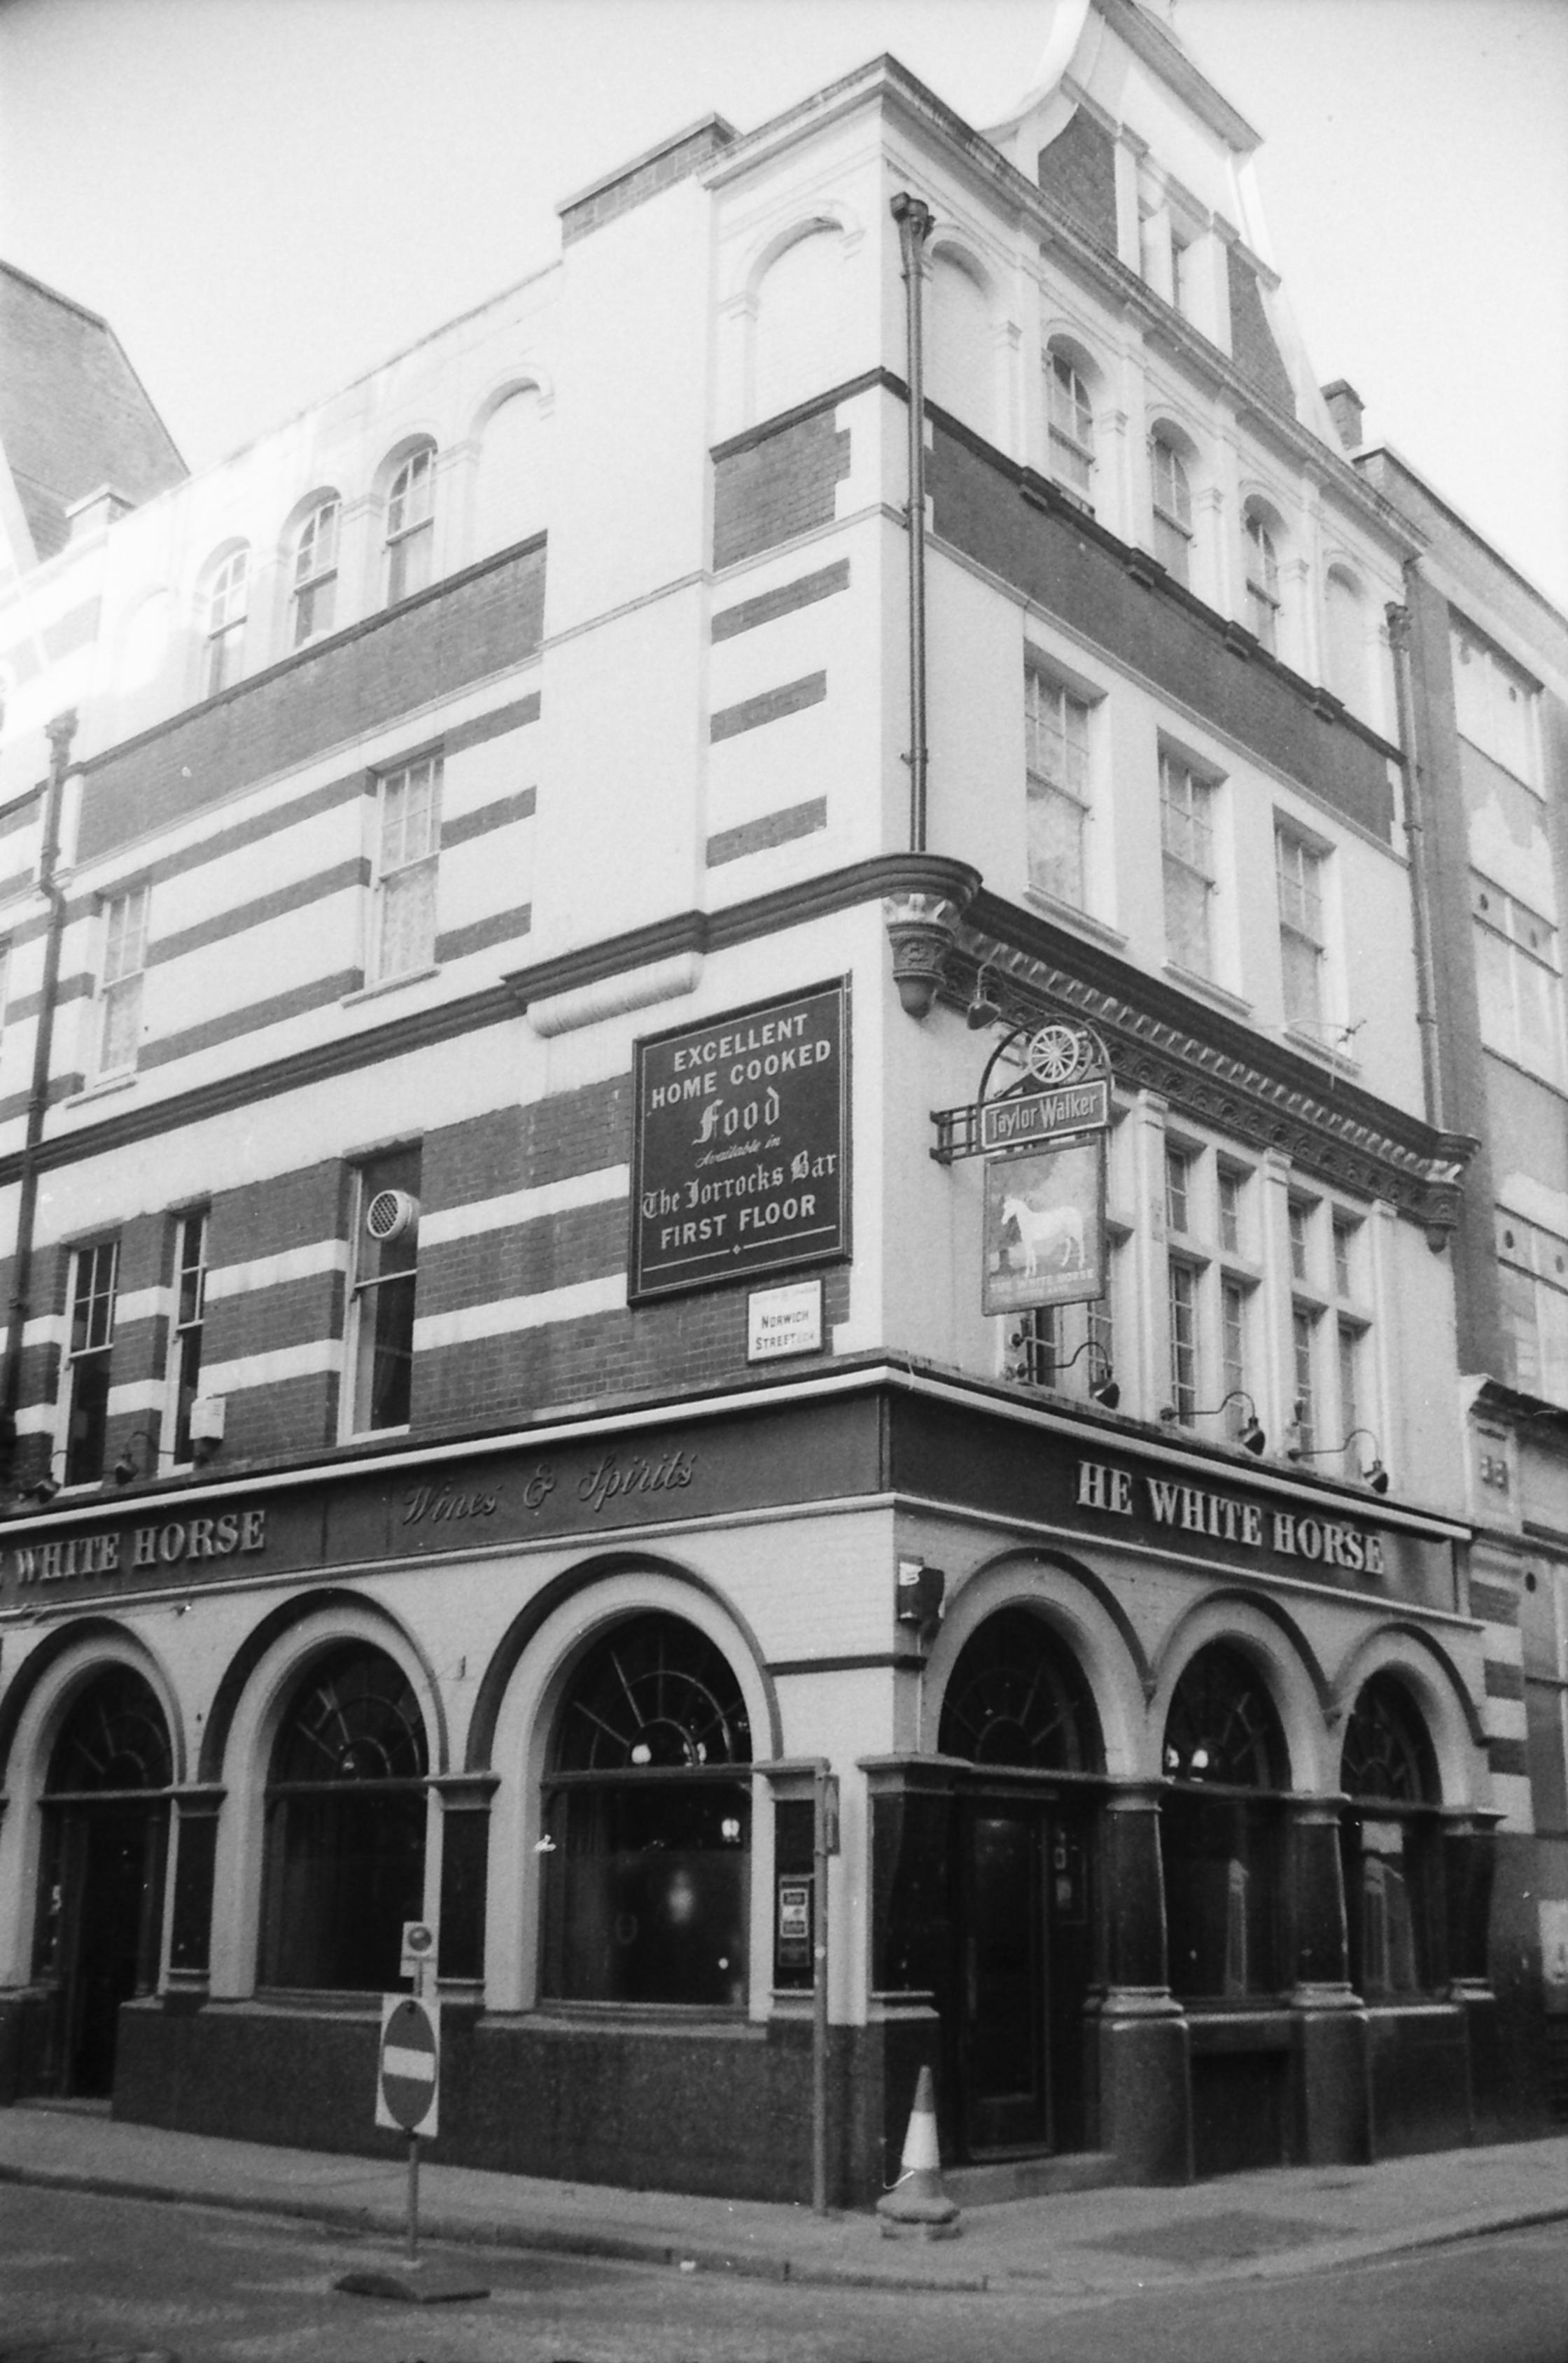 East London City Beer Guide 1991